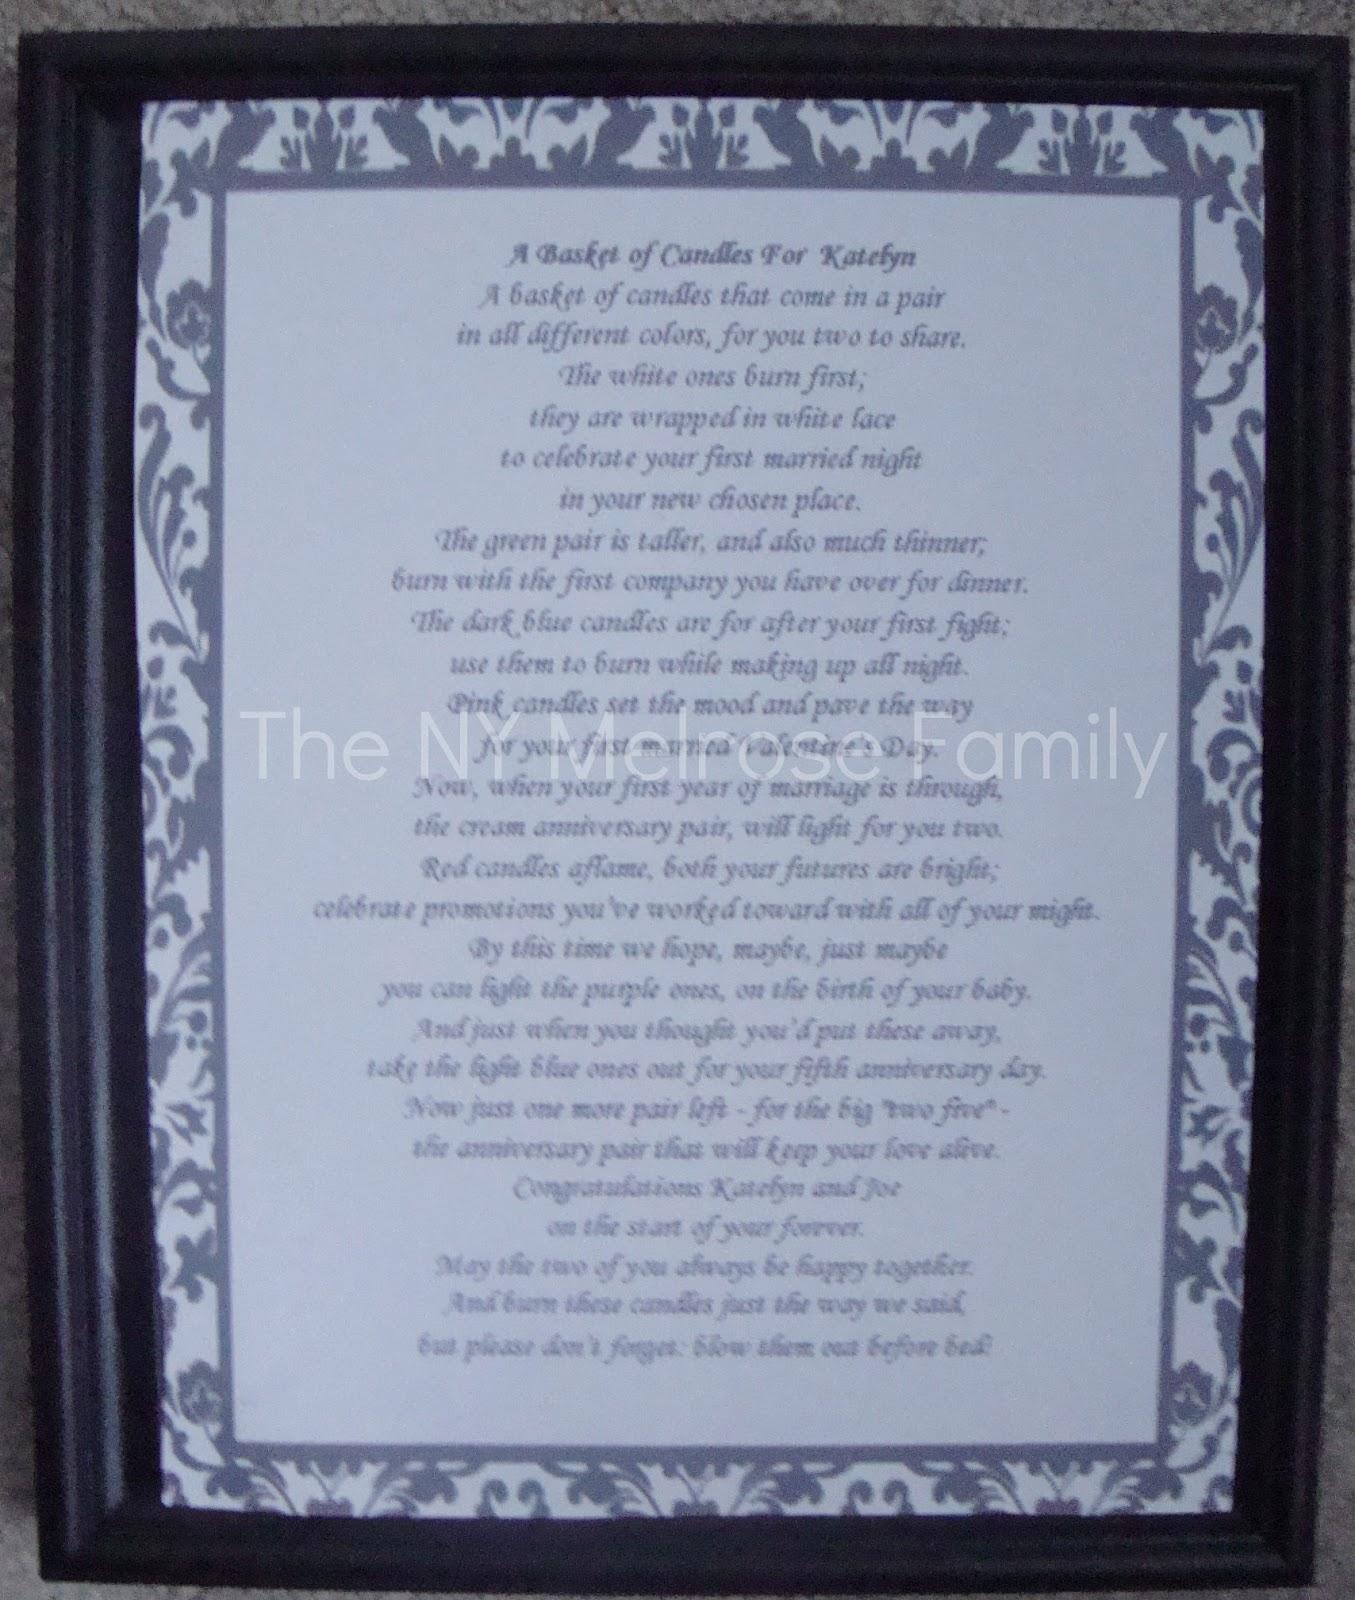 edee3365f3476f Bridal Shower Gift  Candle Poem Basket - The Melrose Family